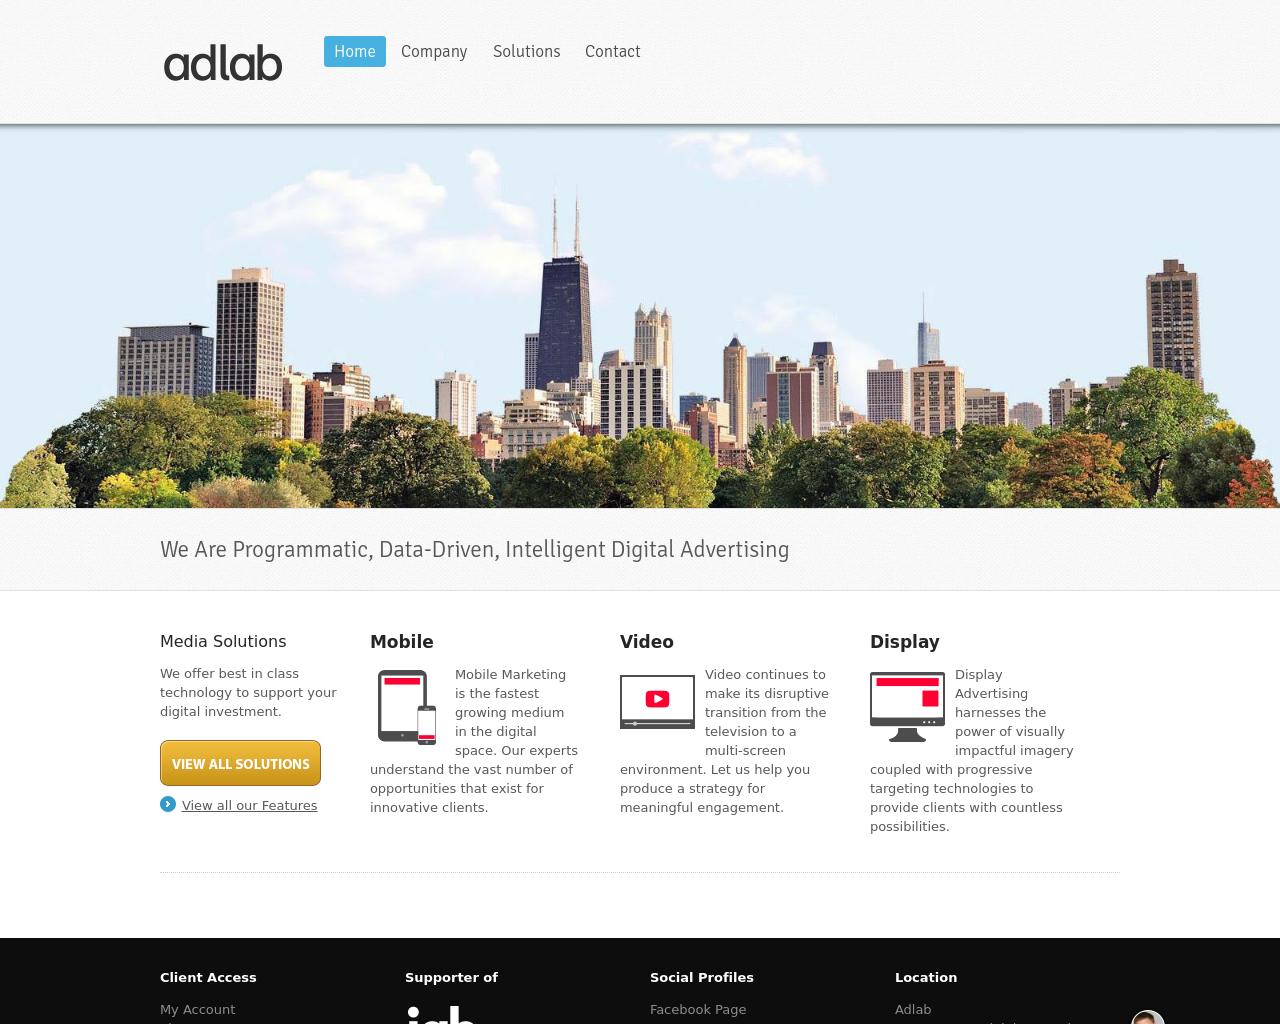 Adlab-Advertising-Reviews-Pricing